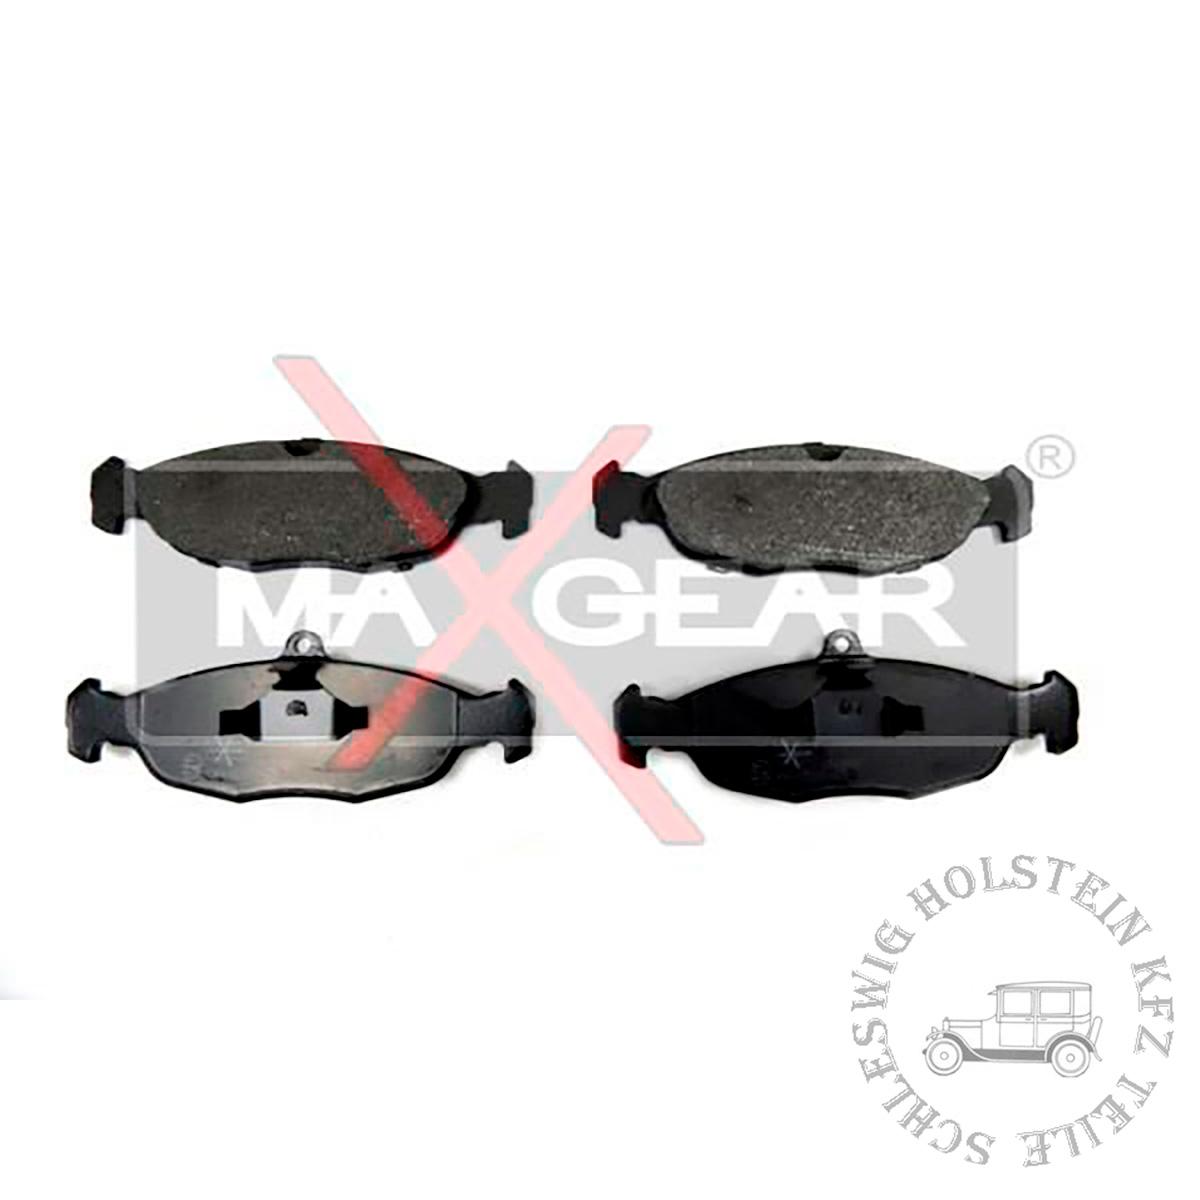 Bremsbelagsatz Vorne für OPEL CORSA B (S93) 1.0 i 12V (F08, F68, M68)